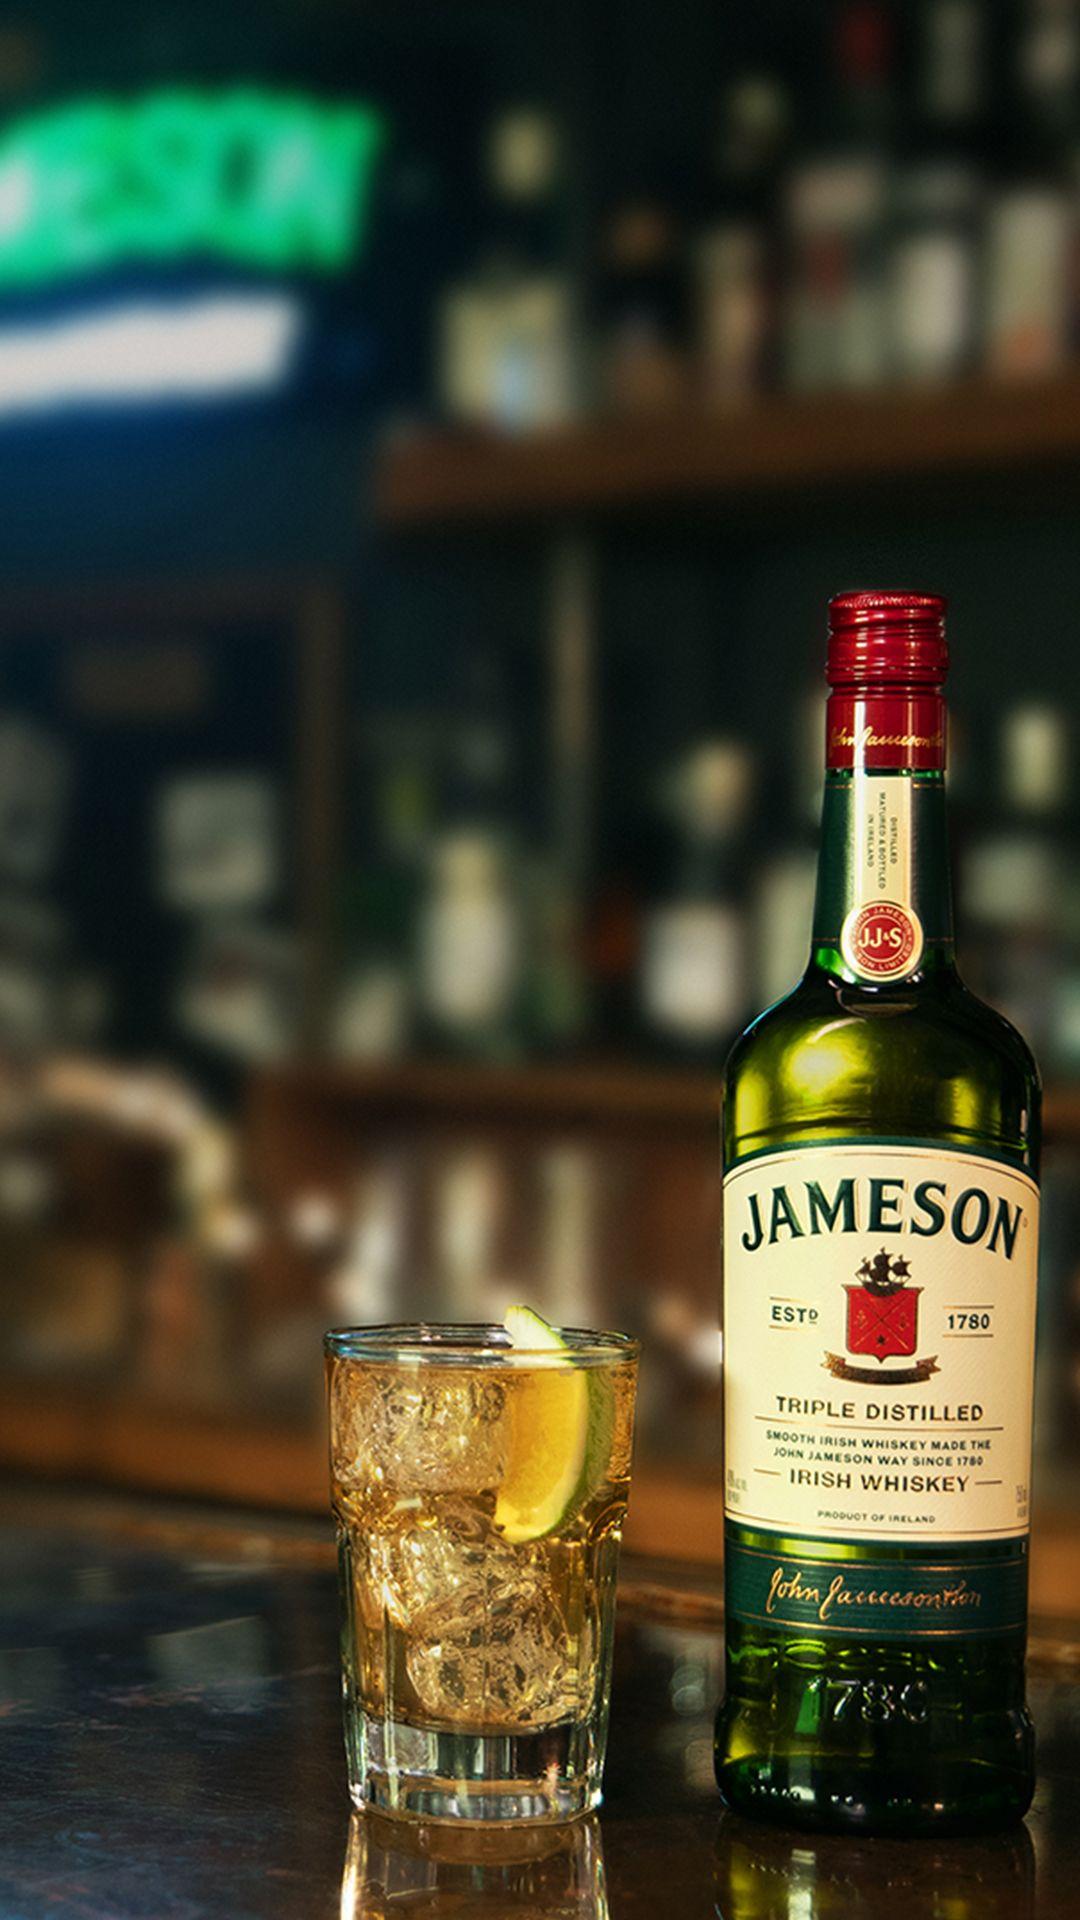 Jameson Zoom Backgrounds Jameson Whiskey Irish Whiskey Delicious Cocktails